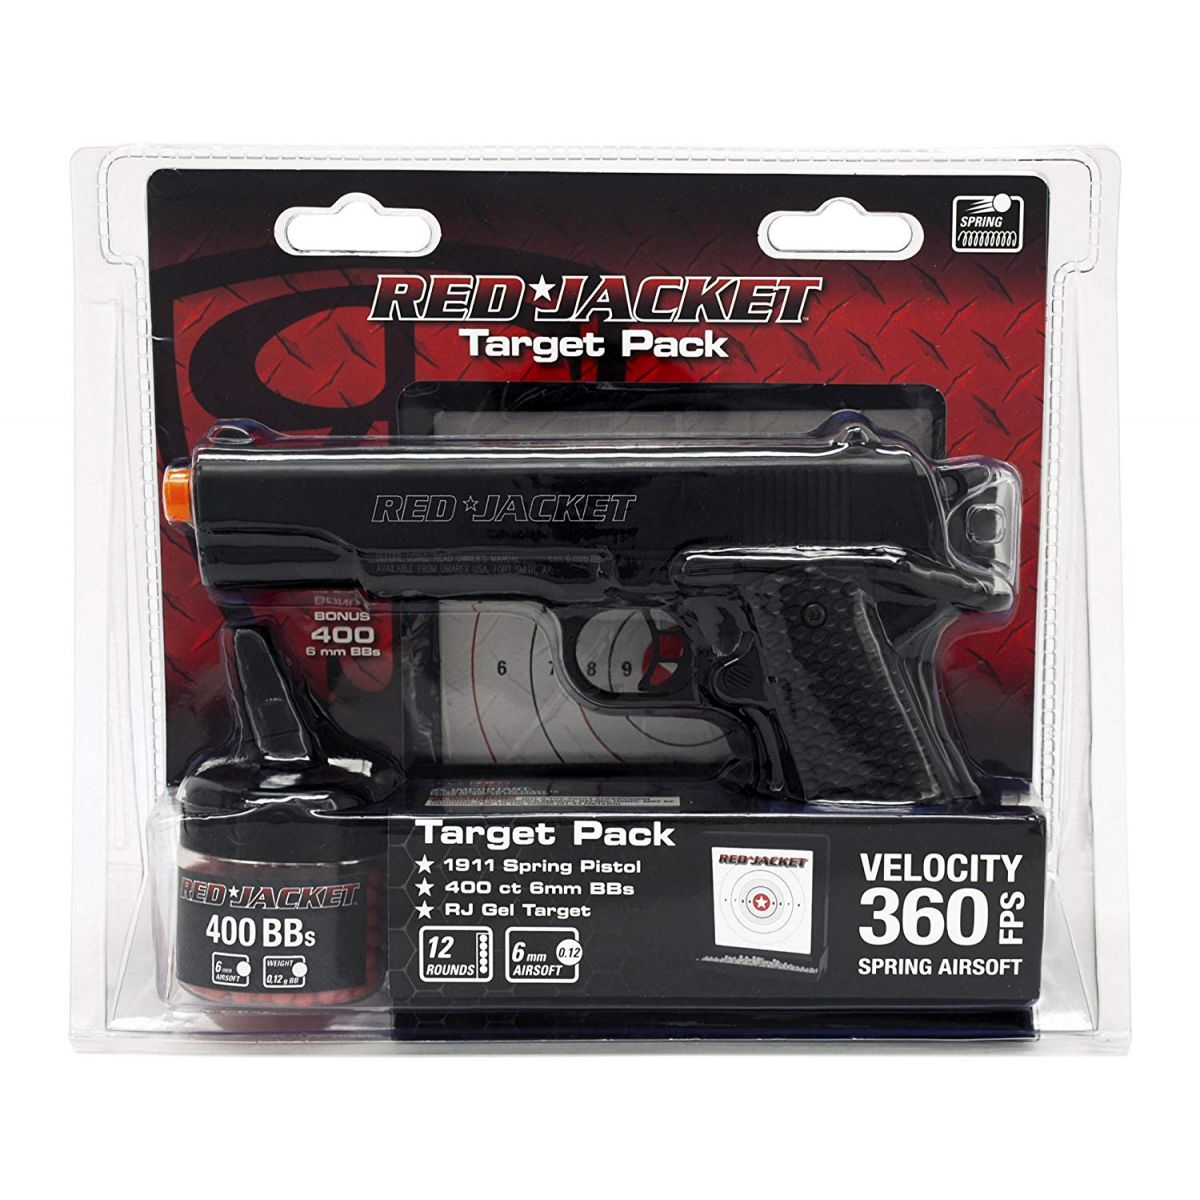 Umarex Red Jacket M1911 6mm Airsoft Spring Pistol Target Pack bundle